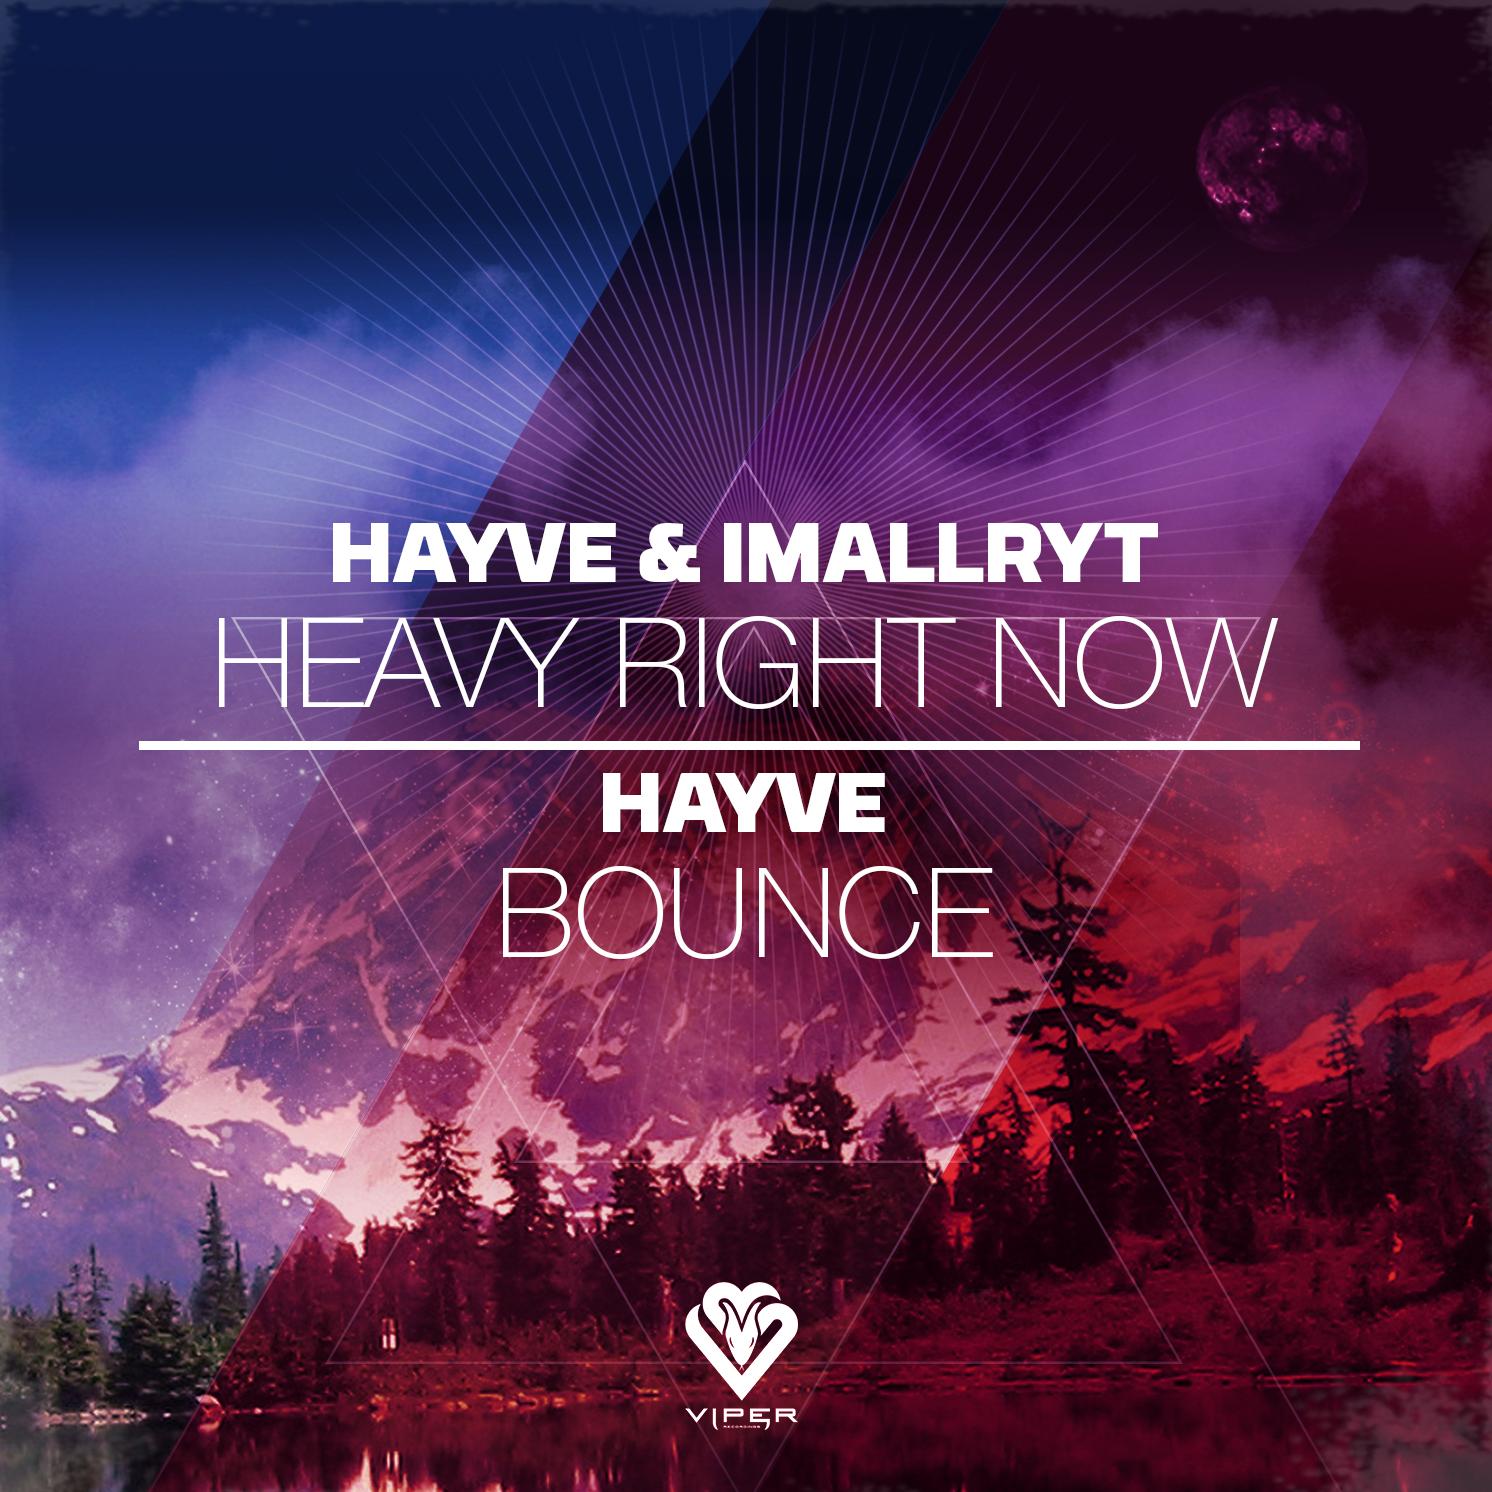 hayve & Imallryt - Heavy Right Now / Bounce Image